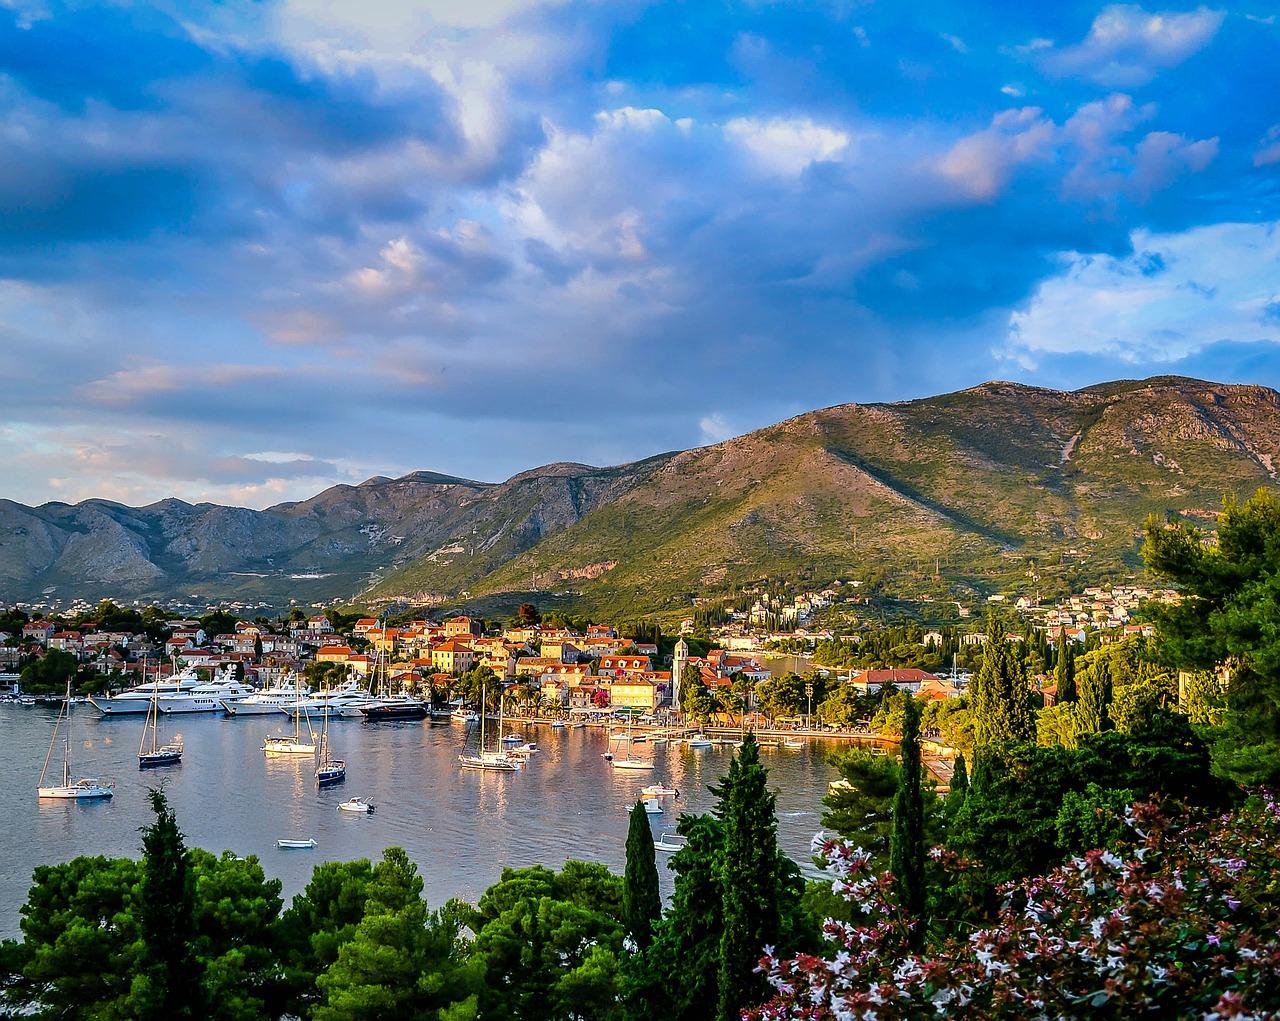 Big step forward in the Montenegro Citizenship Program